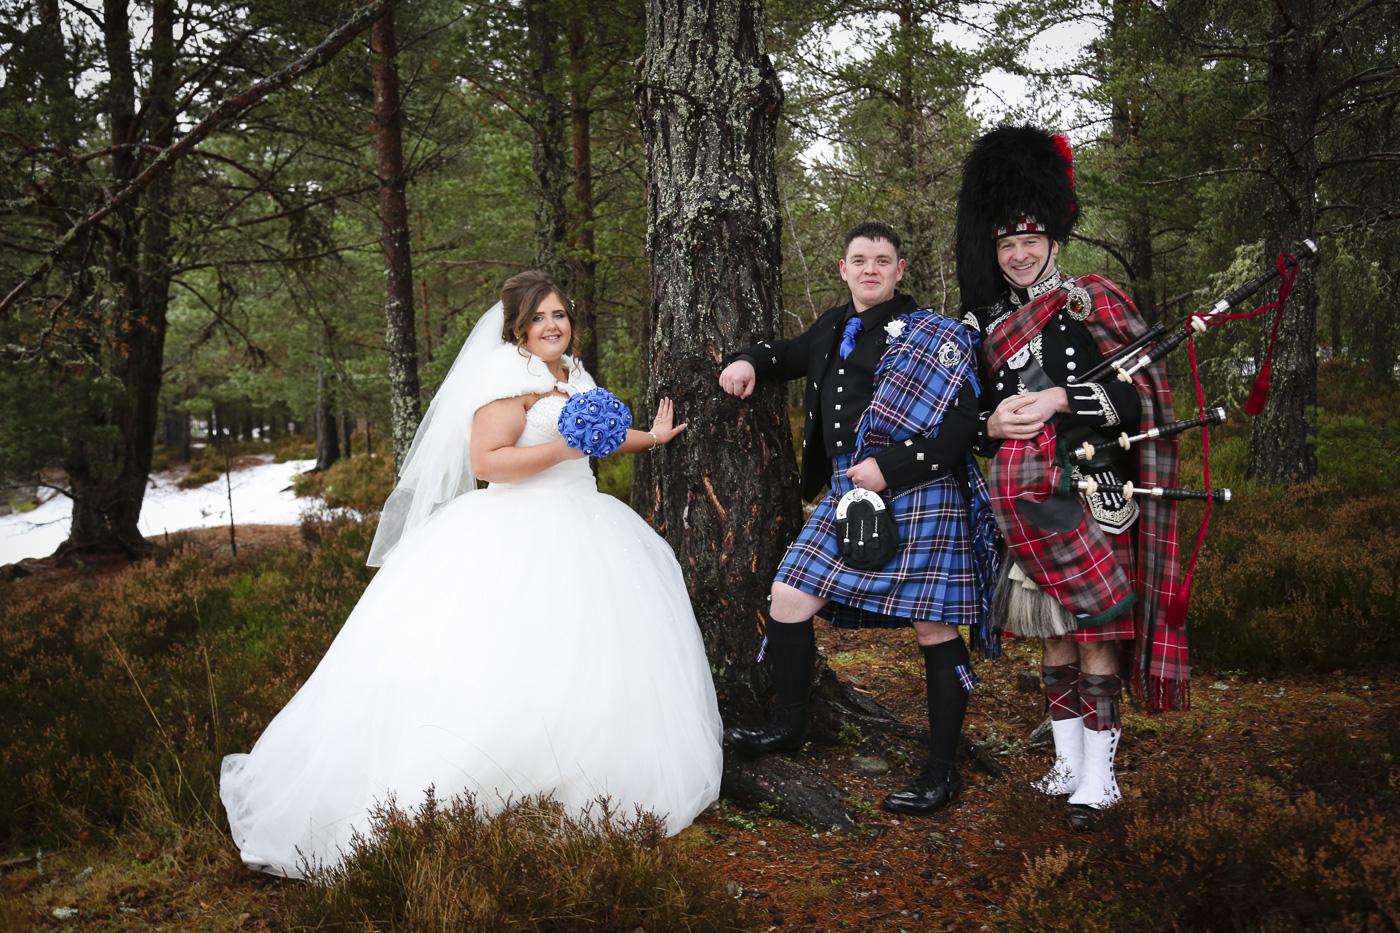 wedding-photography-at-the-hilton-coylumbridge-aviemore-8048